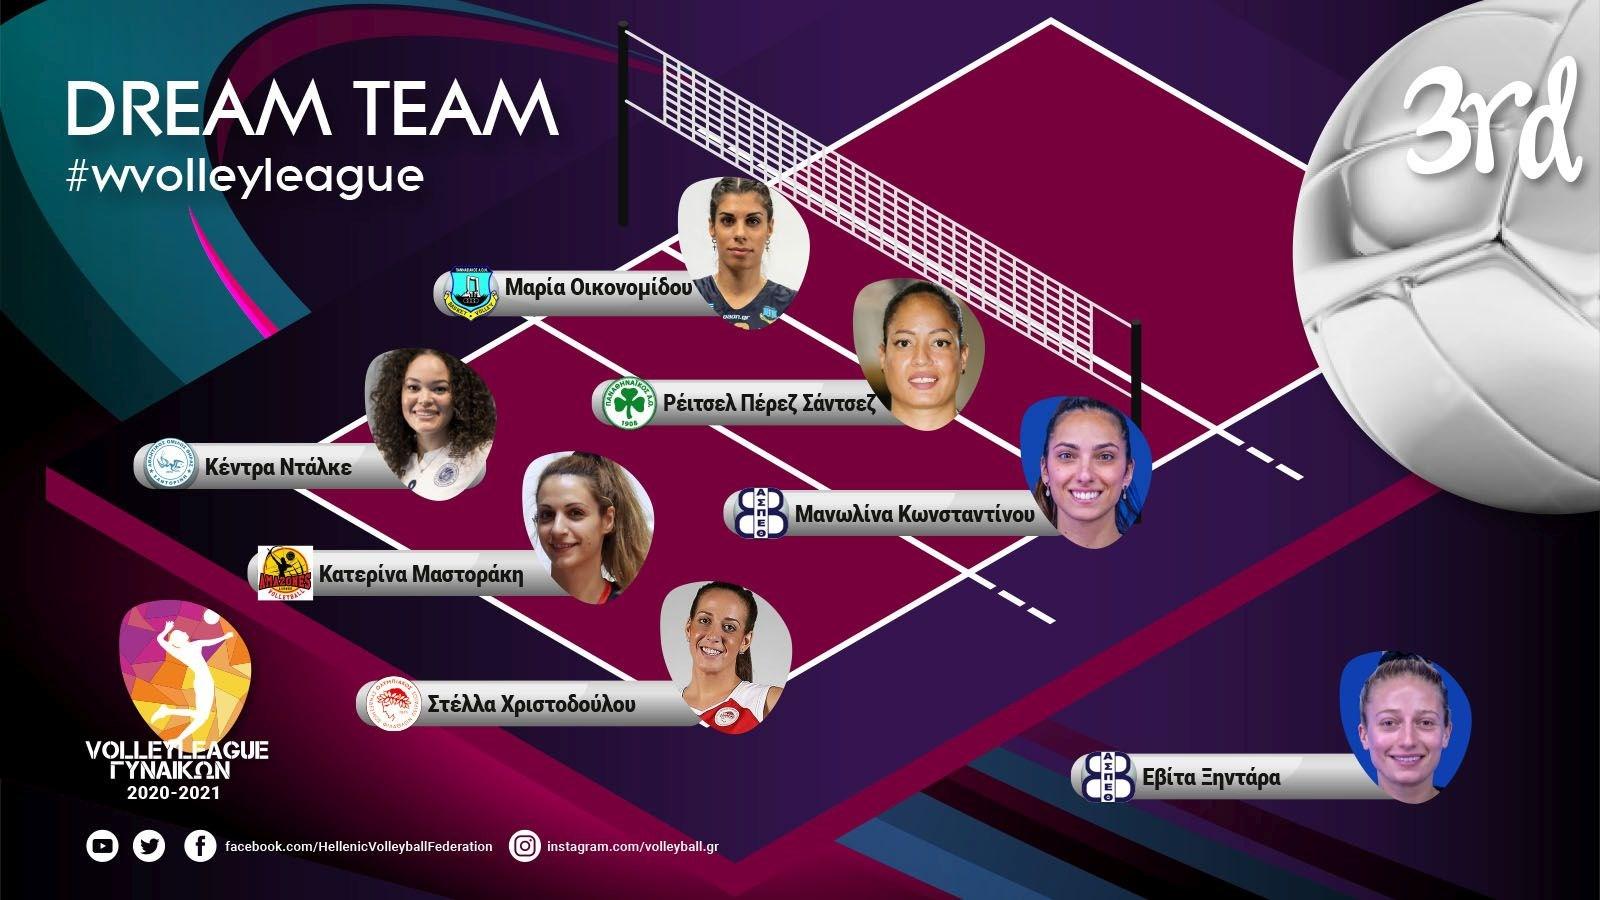 Dream team 3ης αγωνιστικής στη Volleyleague